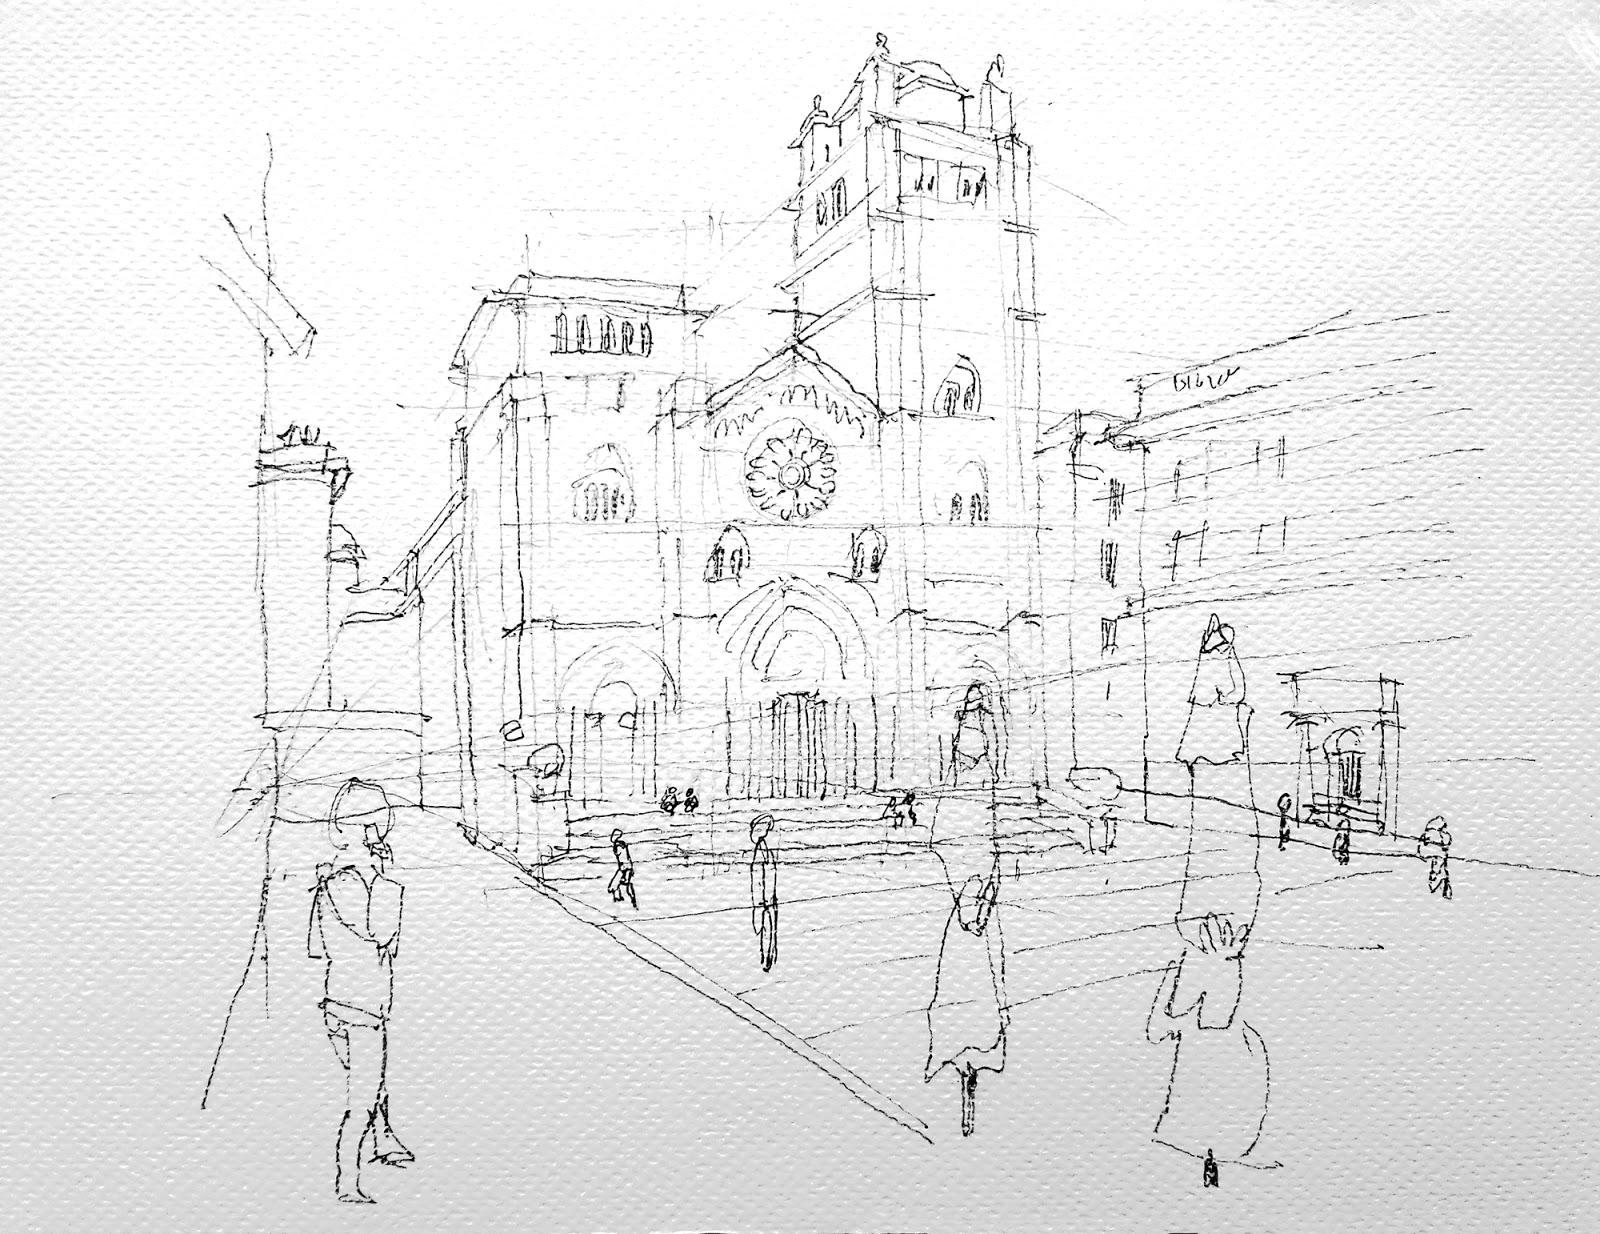 Disegno a matita di piazza San Lorenzo e cattedrale.